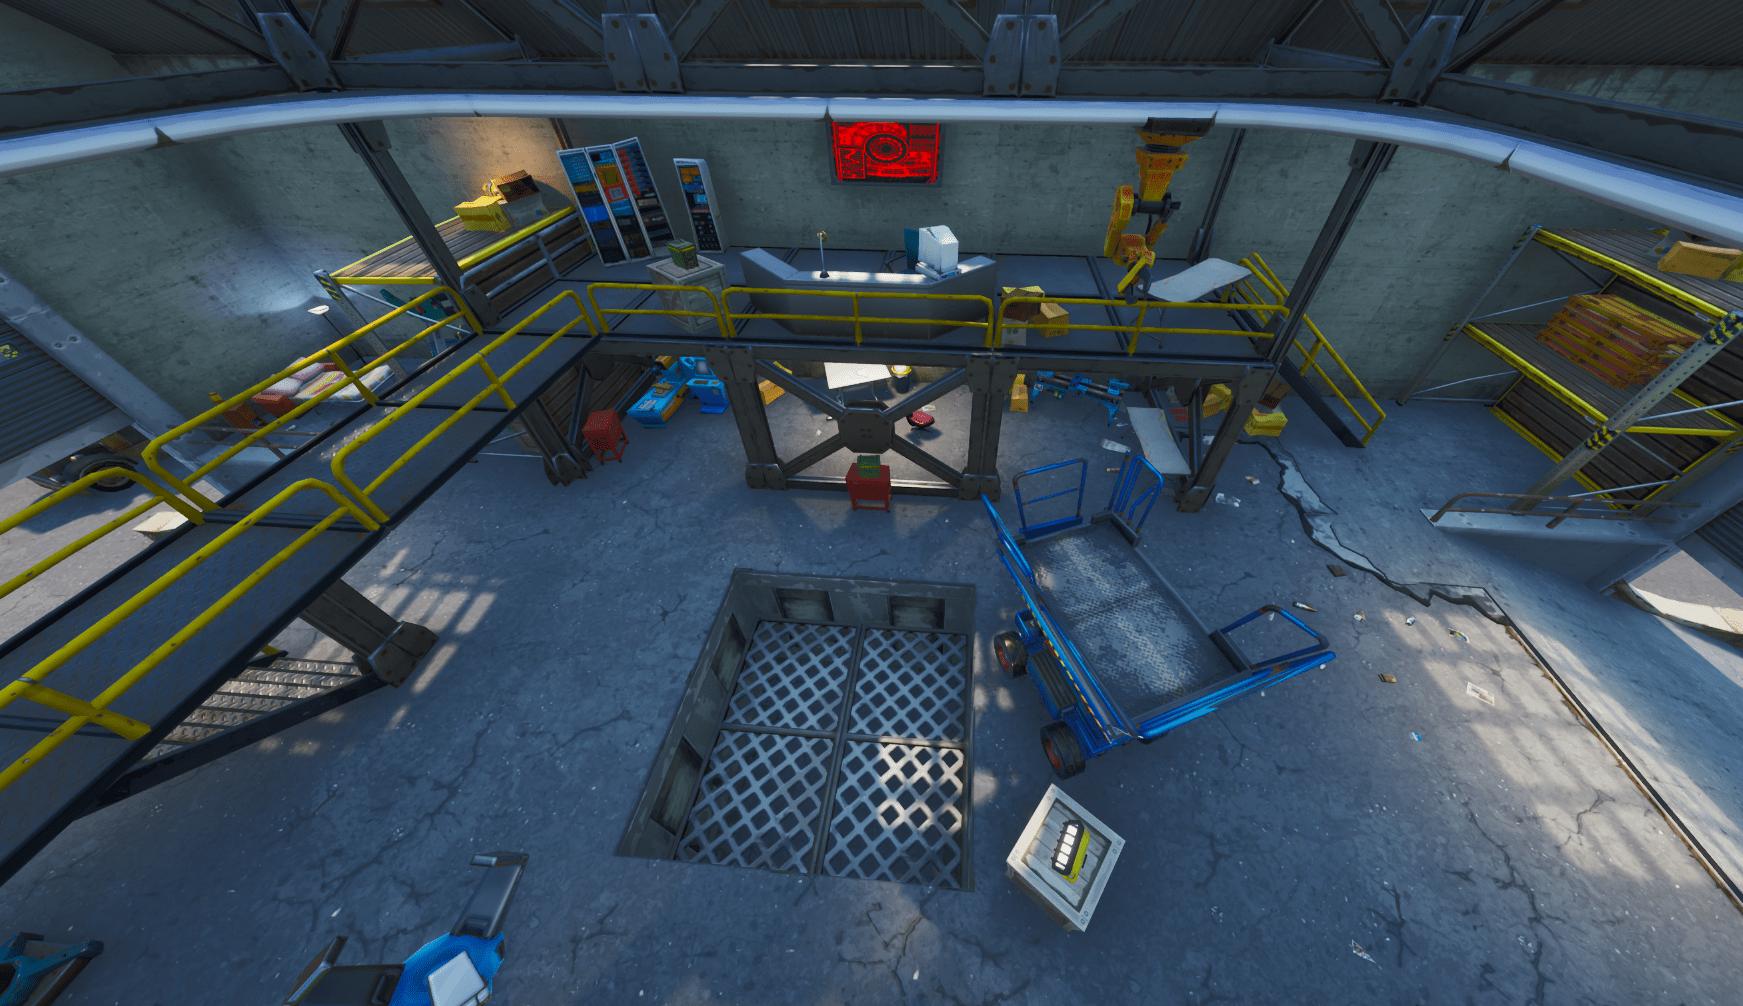 Fortnite v10.30 Map Changes - Inside Dusty Depot